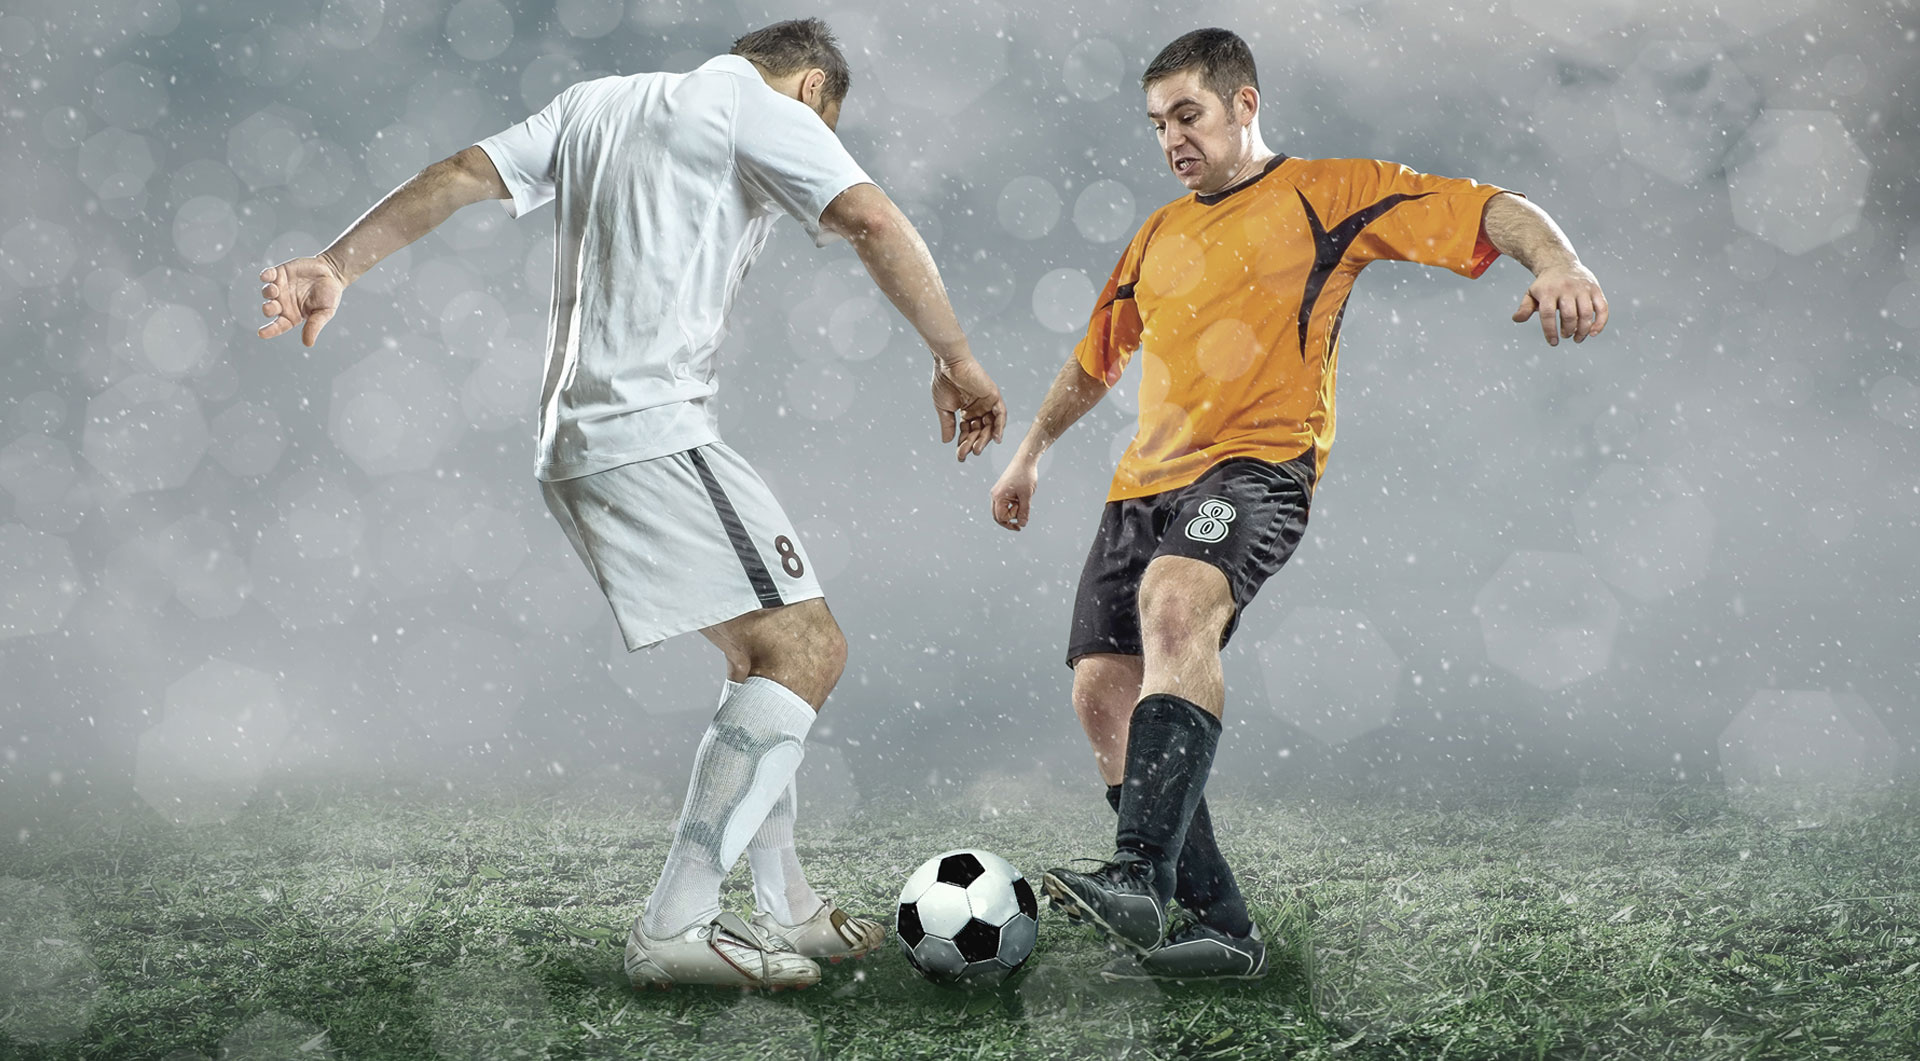 watch-a.-radwanska-vs-s.-fichman-1st-round-online